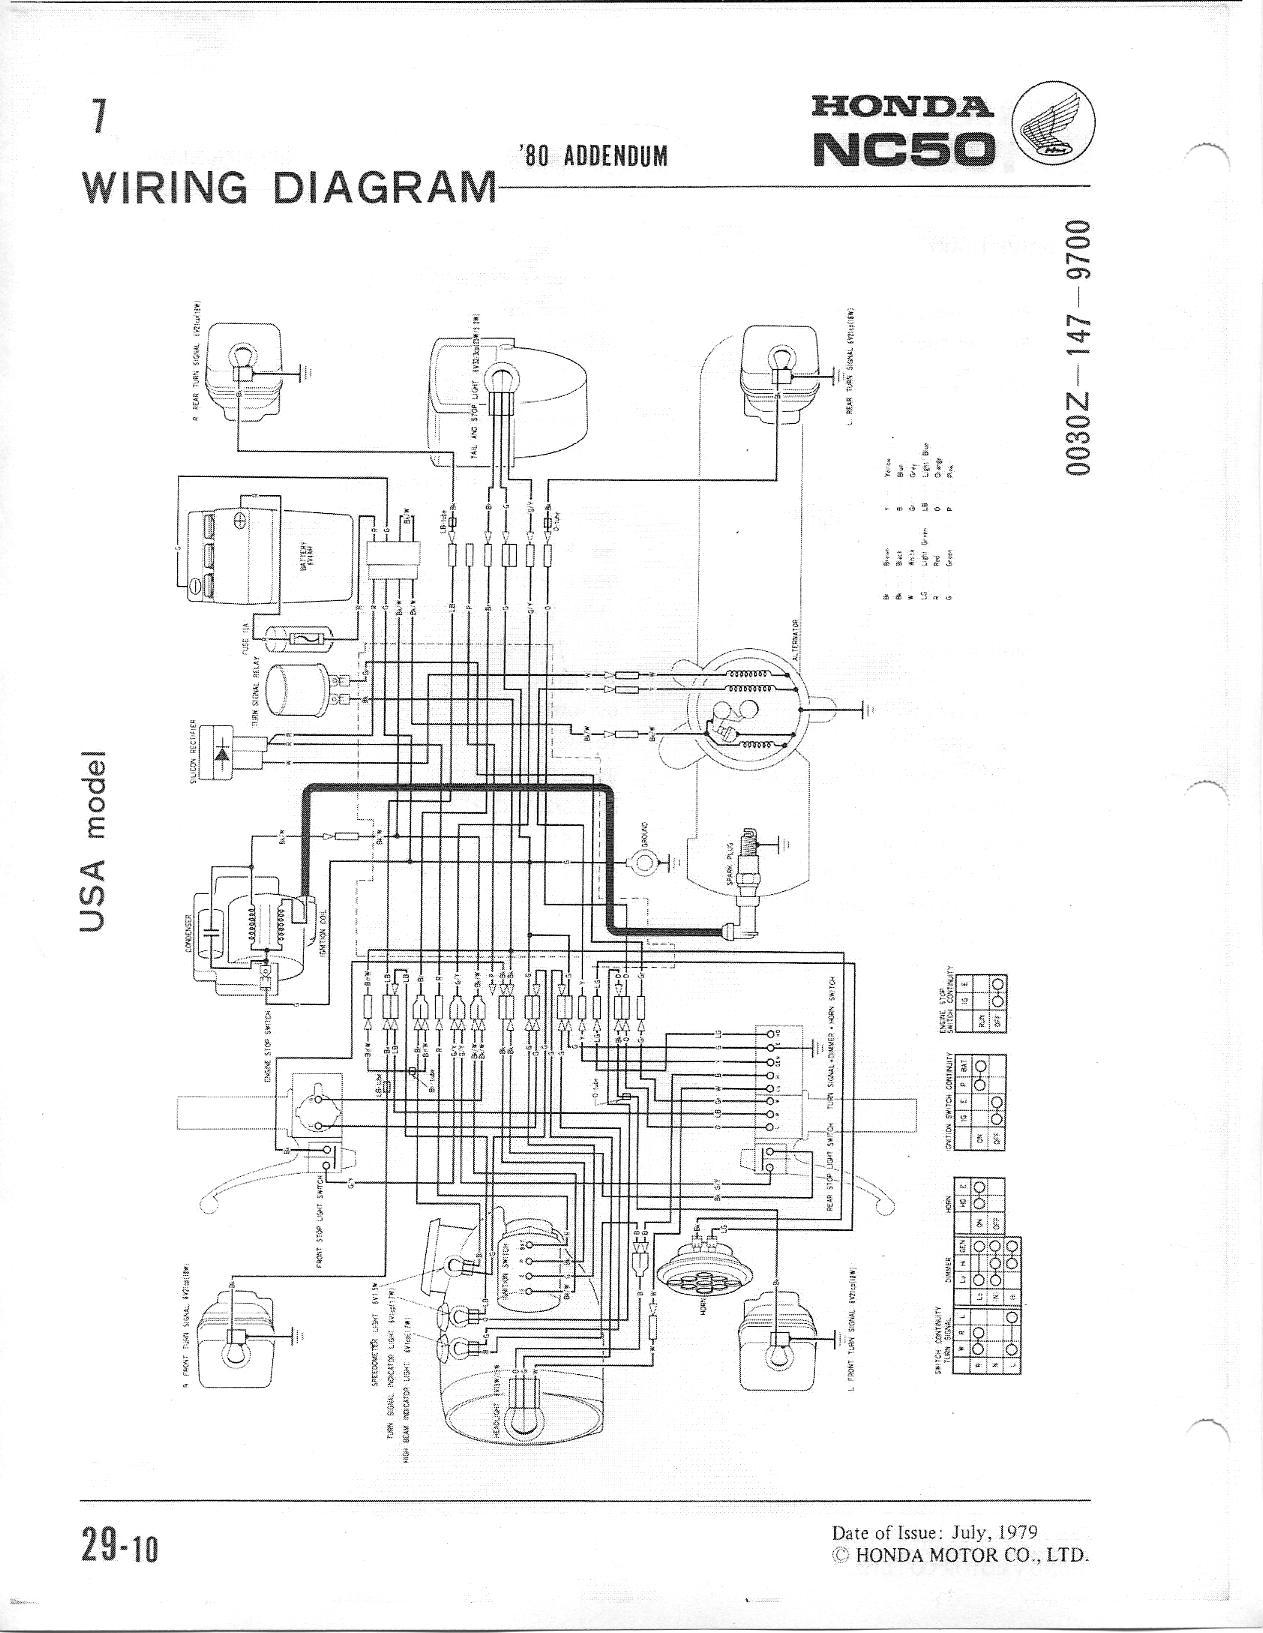 Honda Express Nc50 Wiring Questions